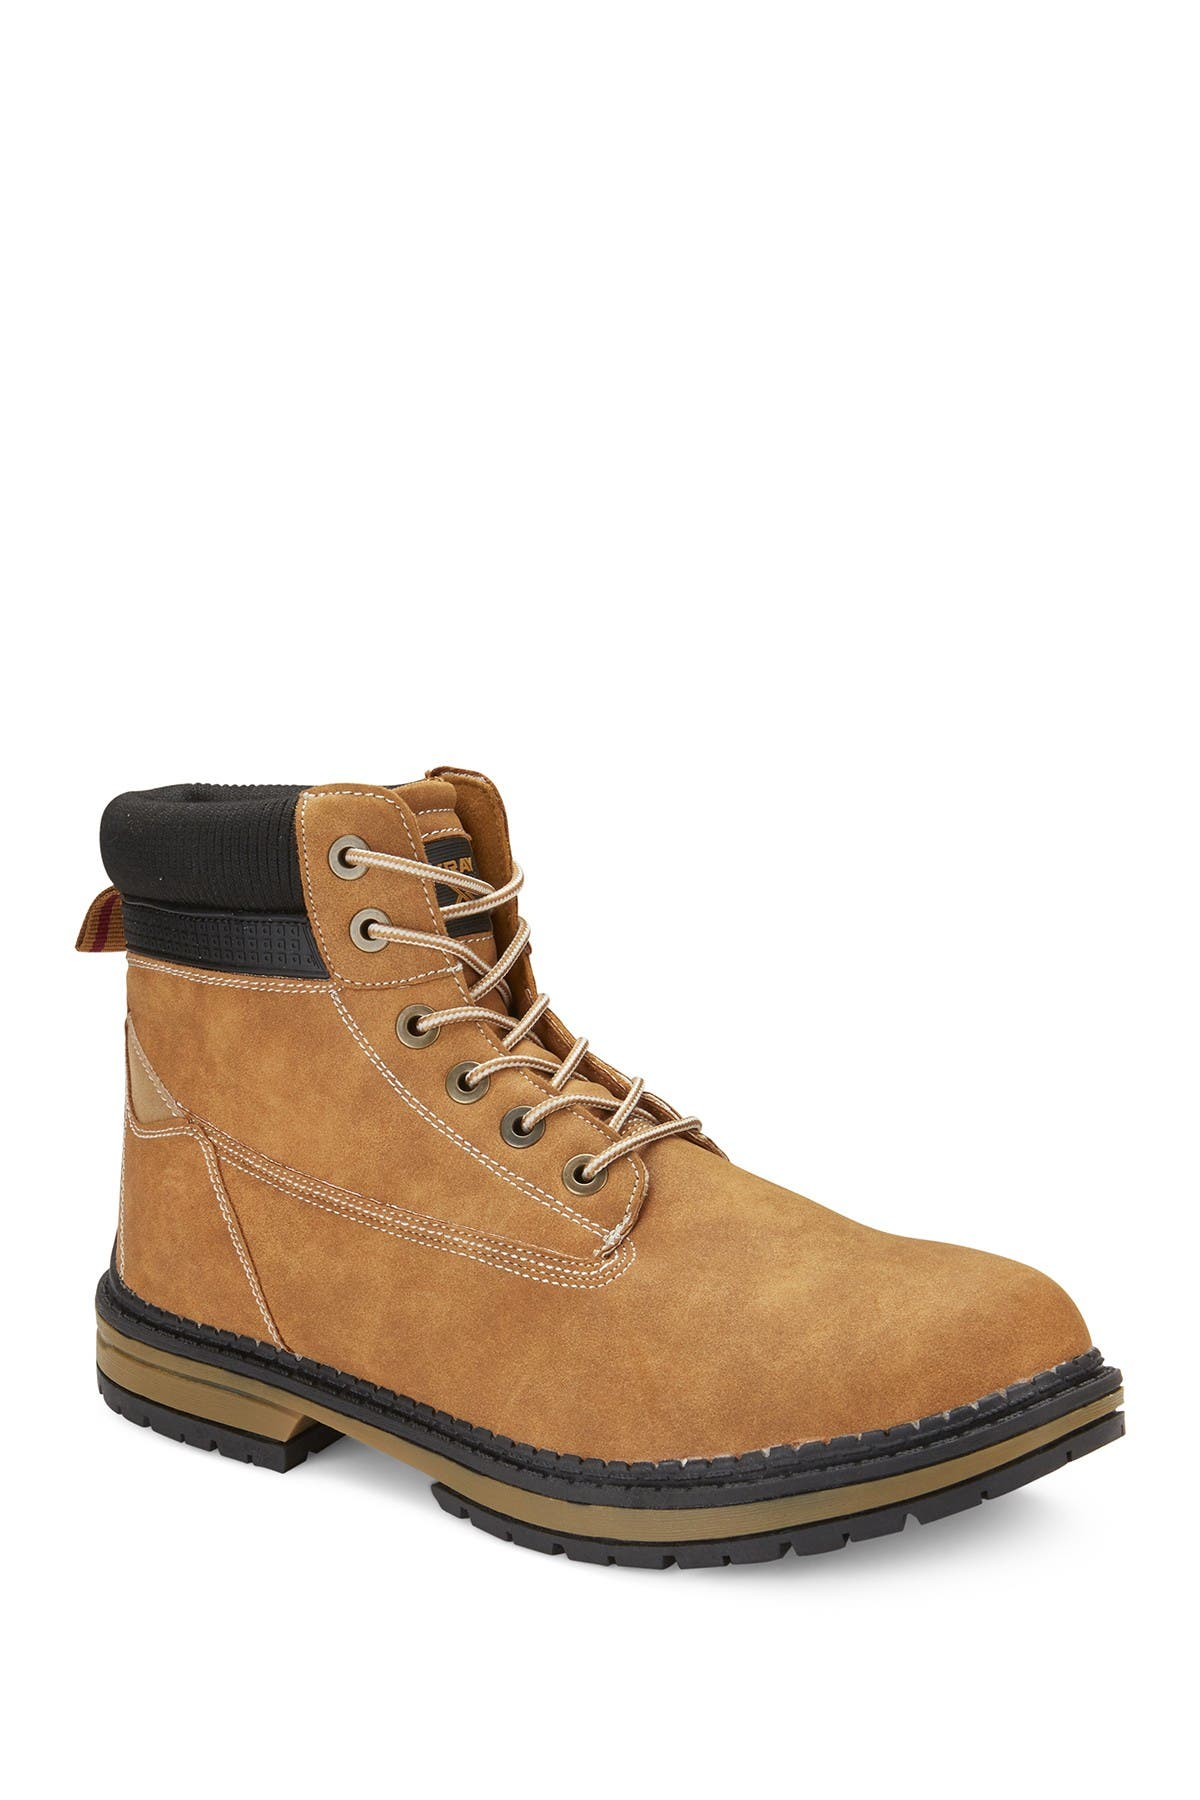 Image of XRAY Fullman Boot